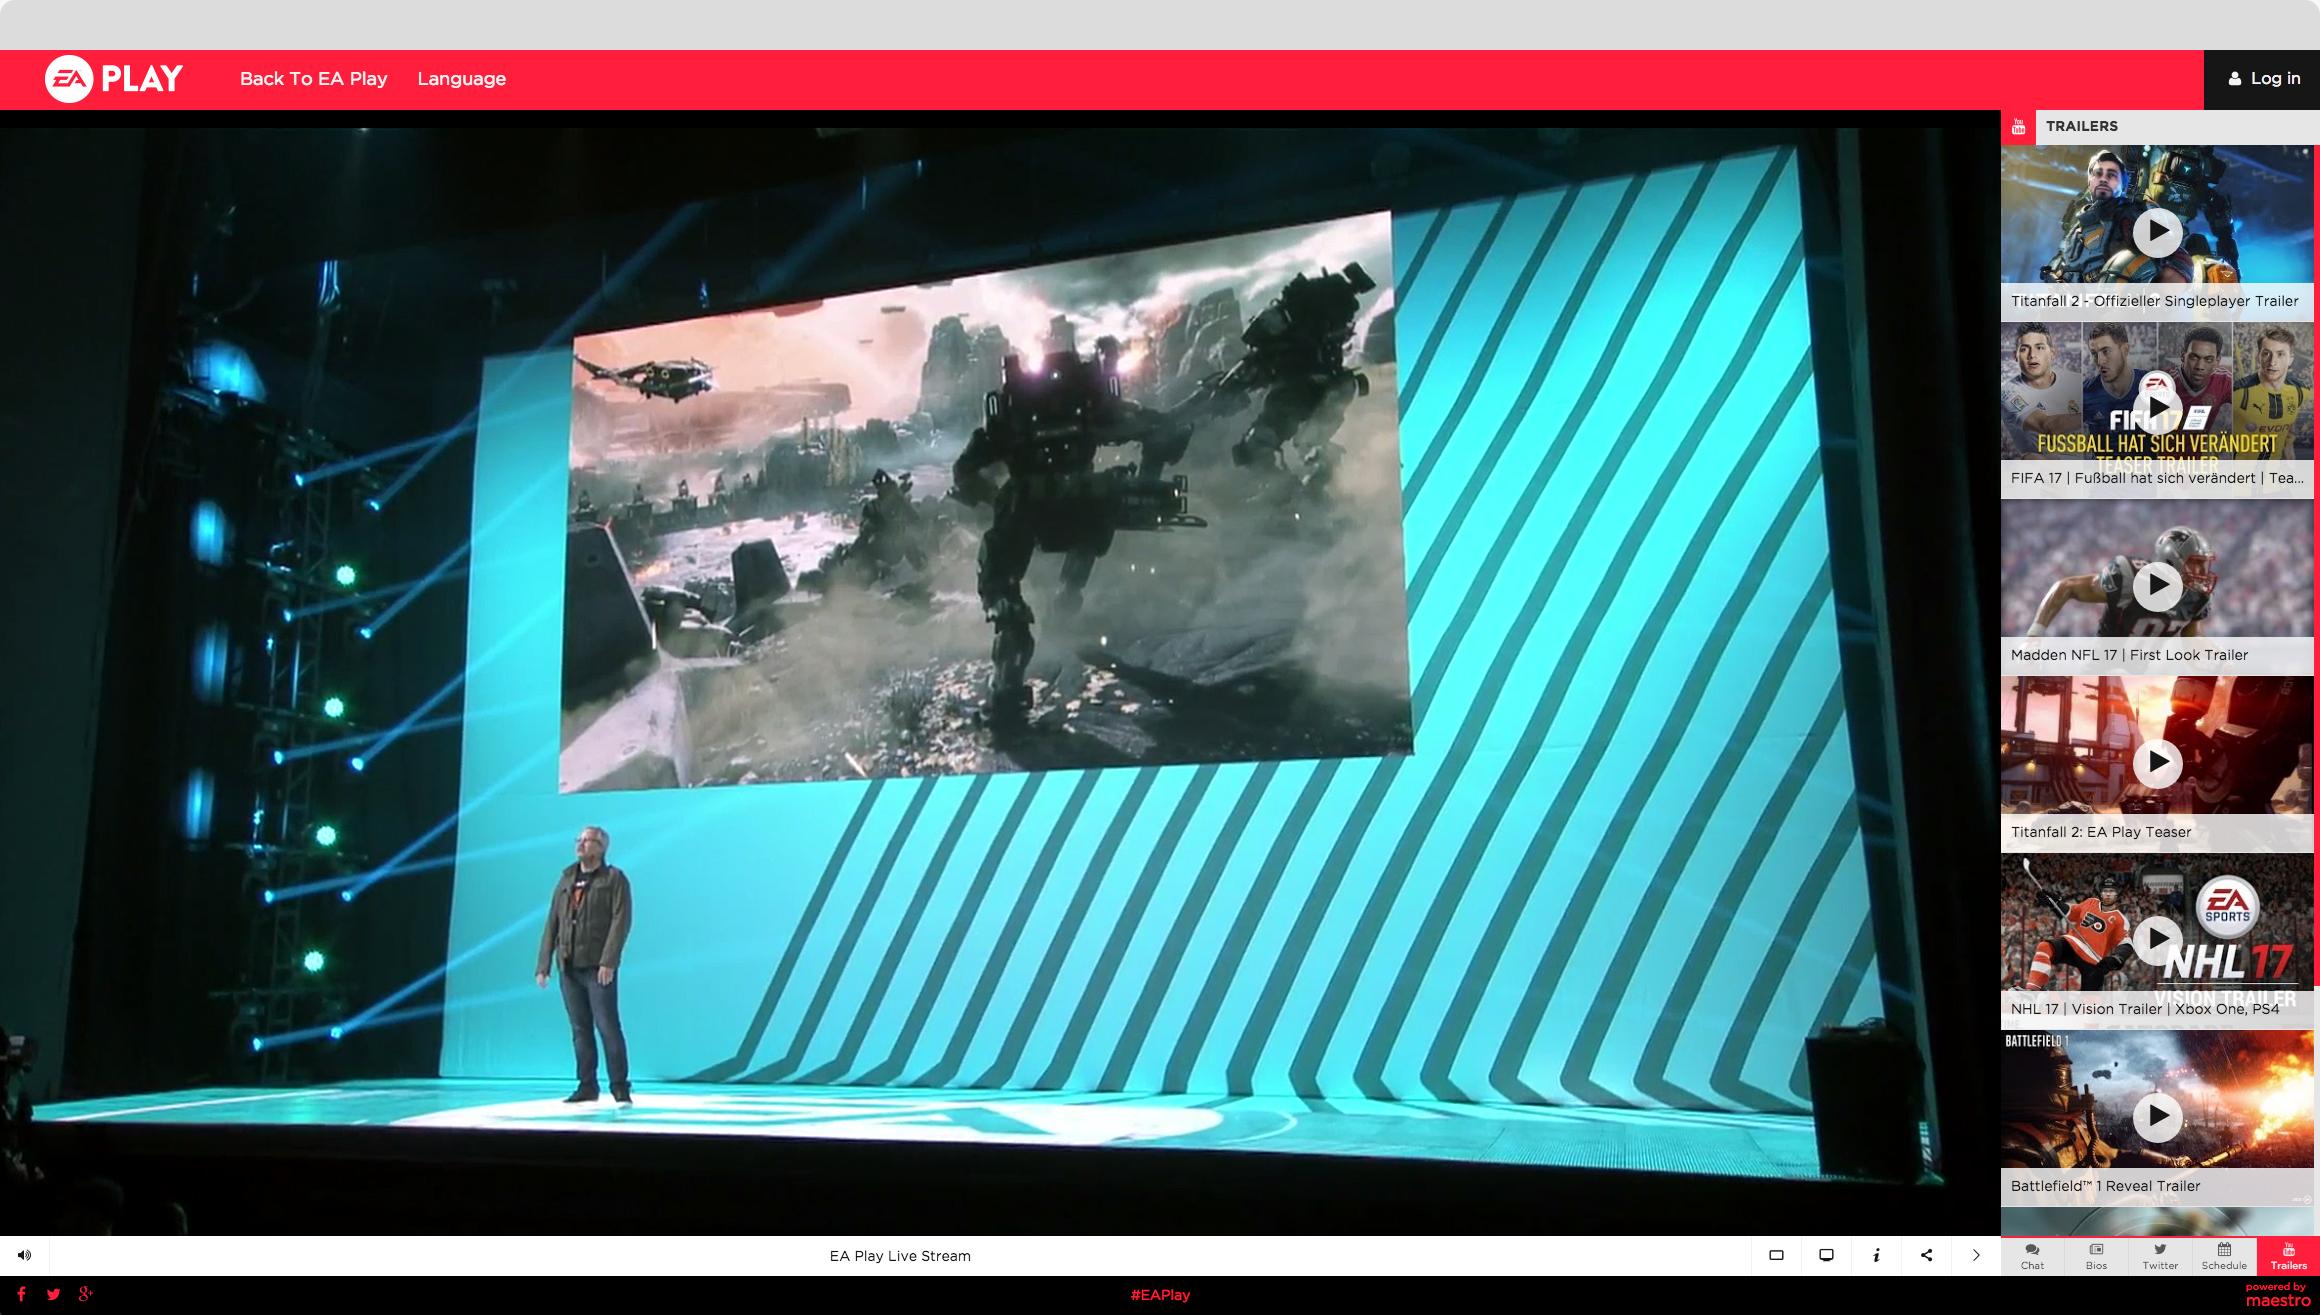 ea_play_2016_livestream_5.jpg